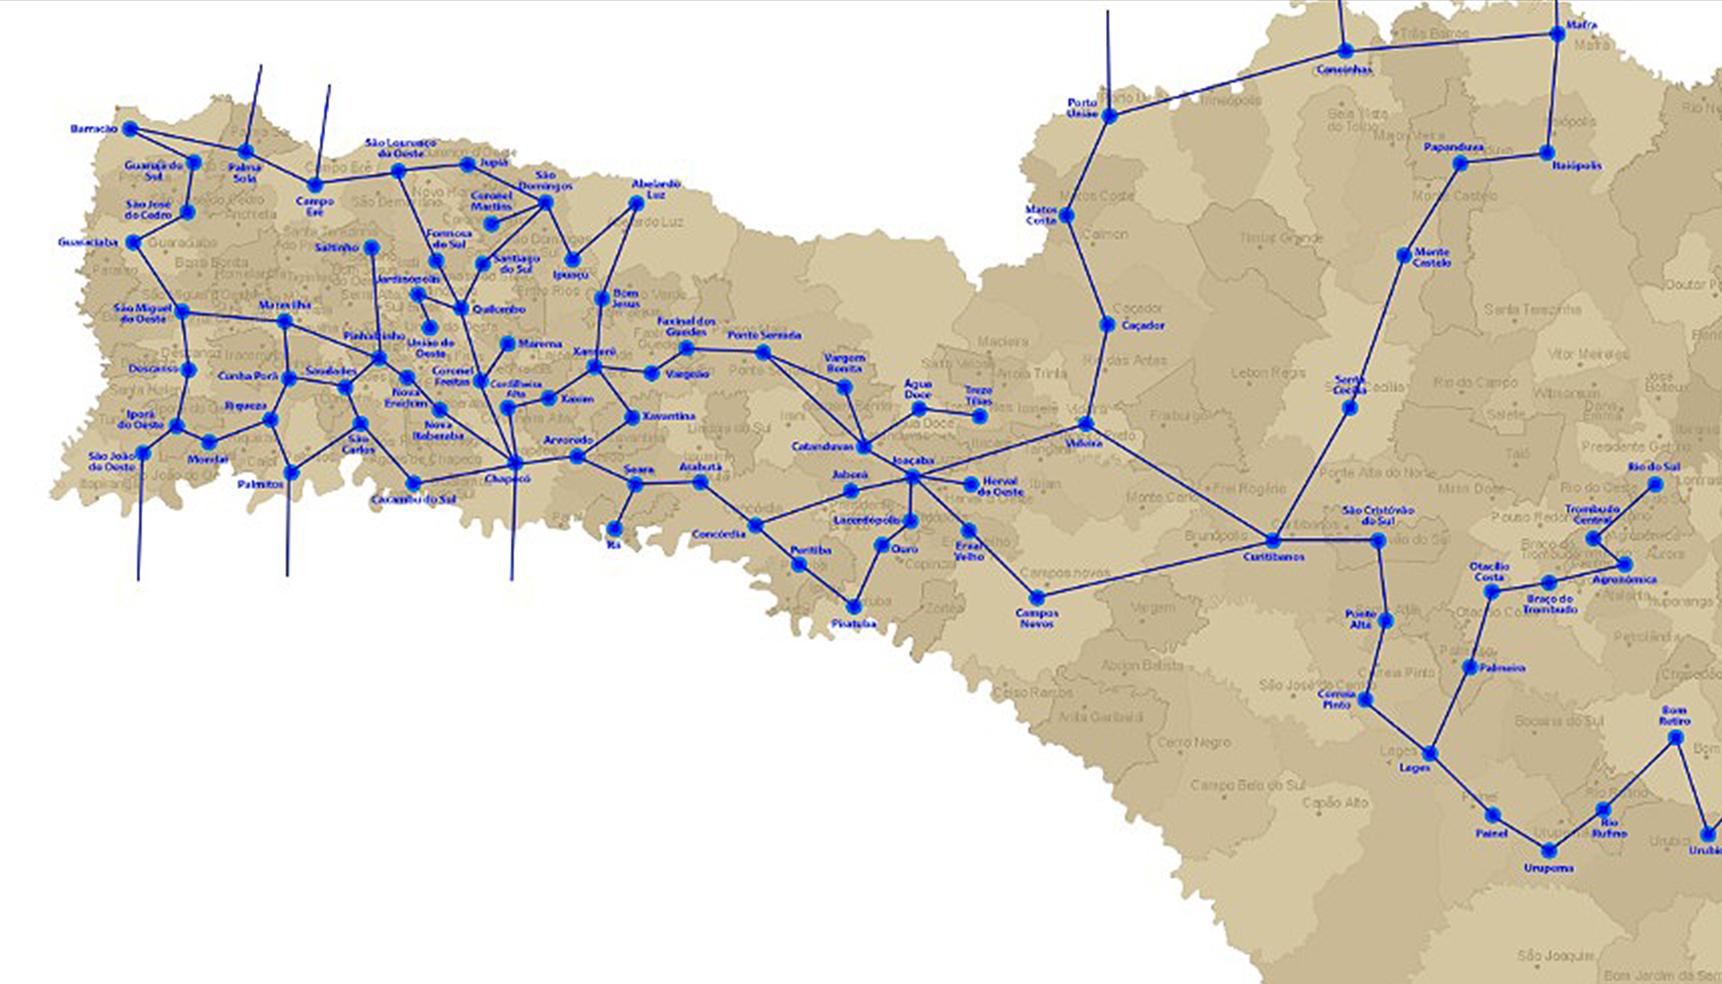 Nome:      mapa-sc2.jpg Visitas:     48 Tamanho:  677,7 KB